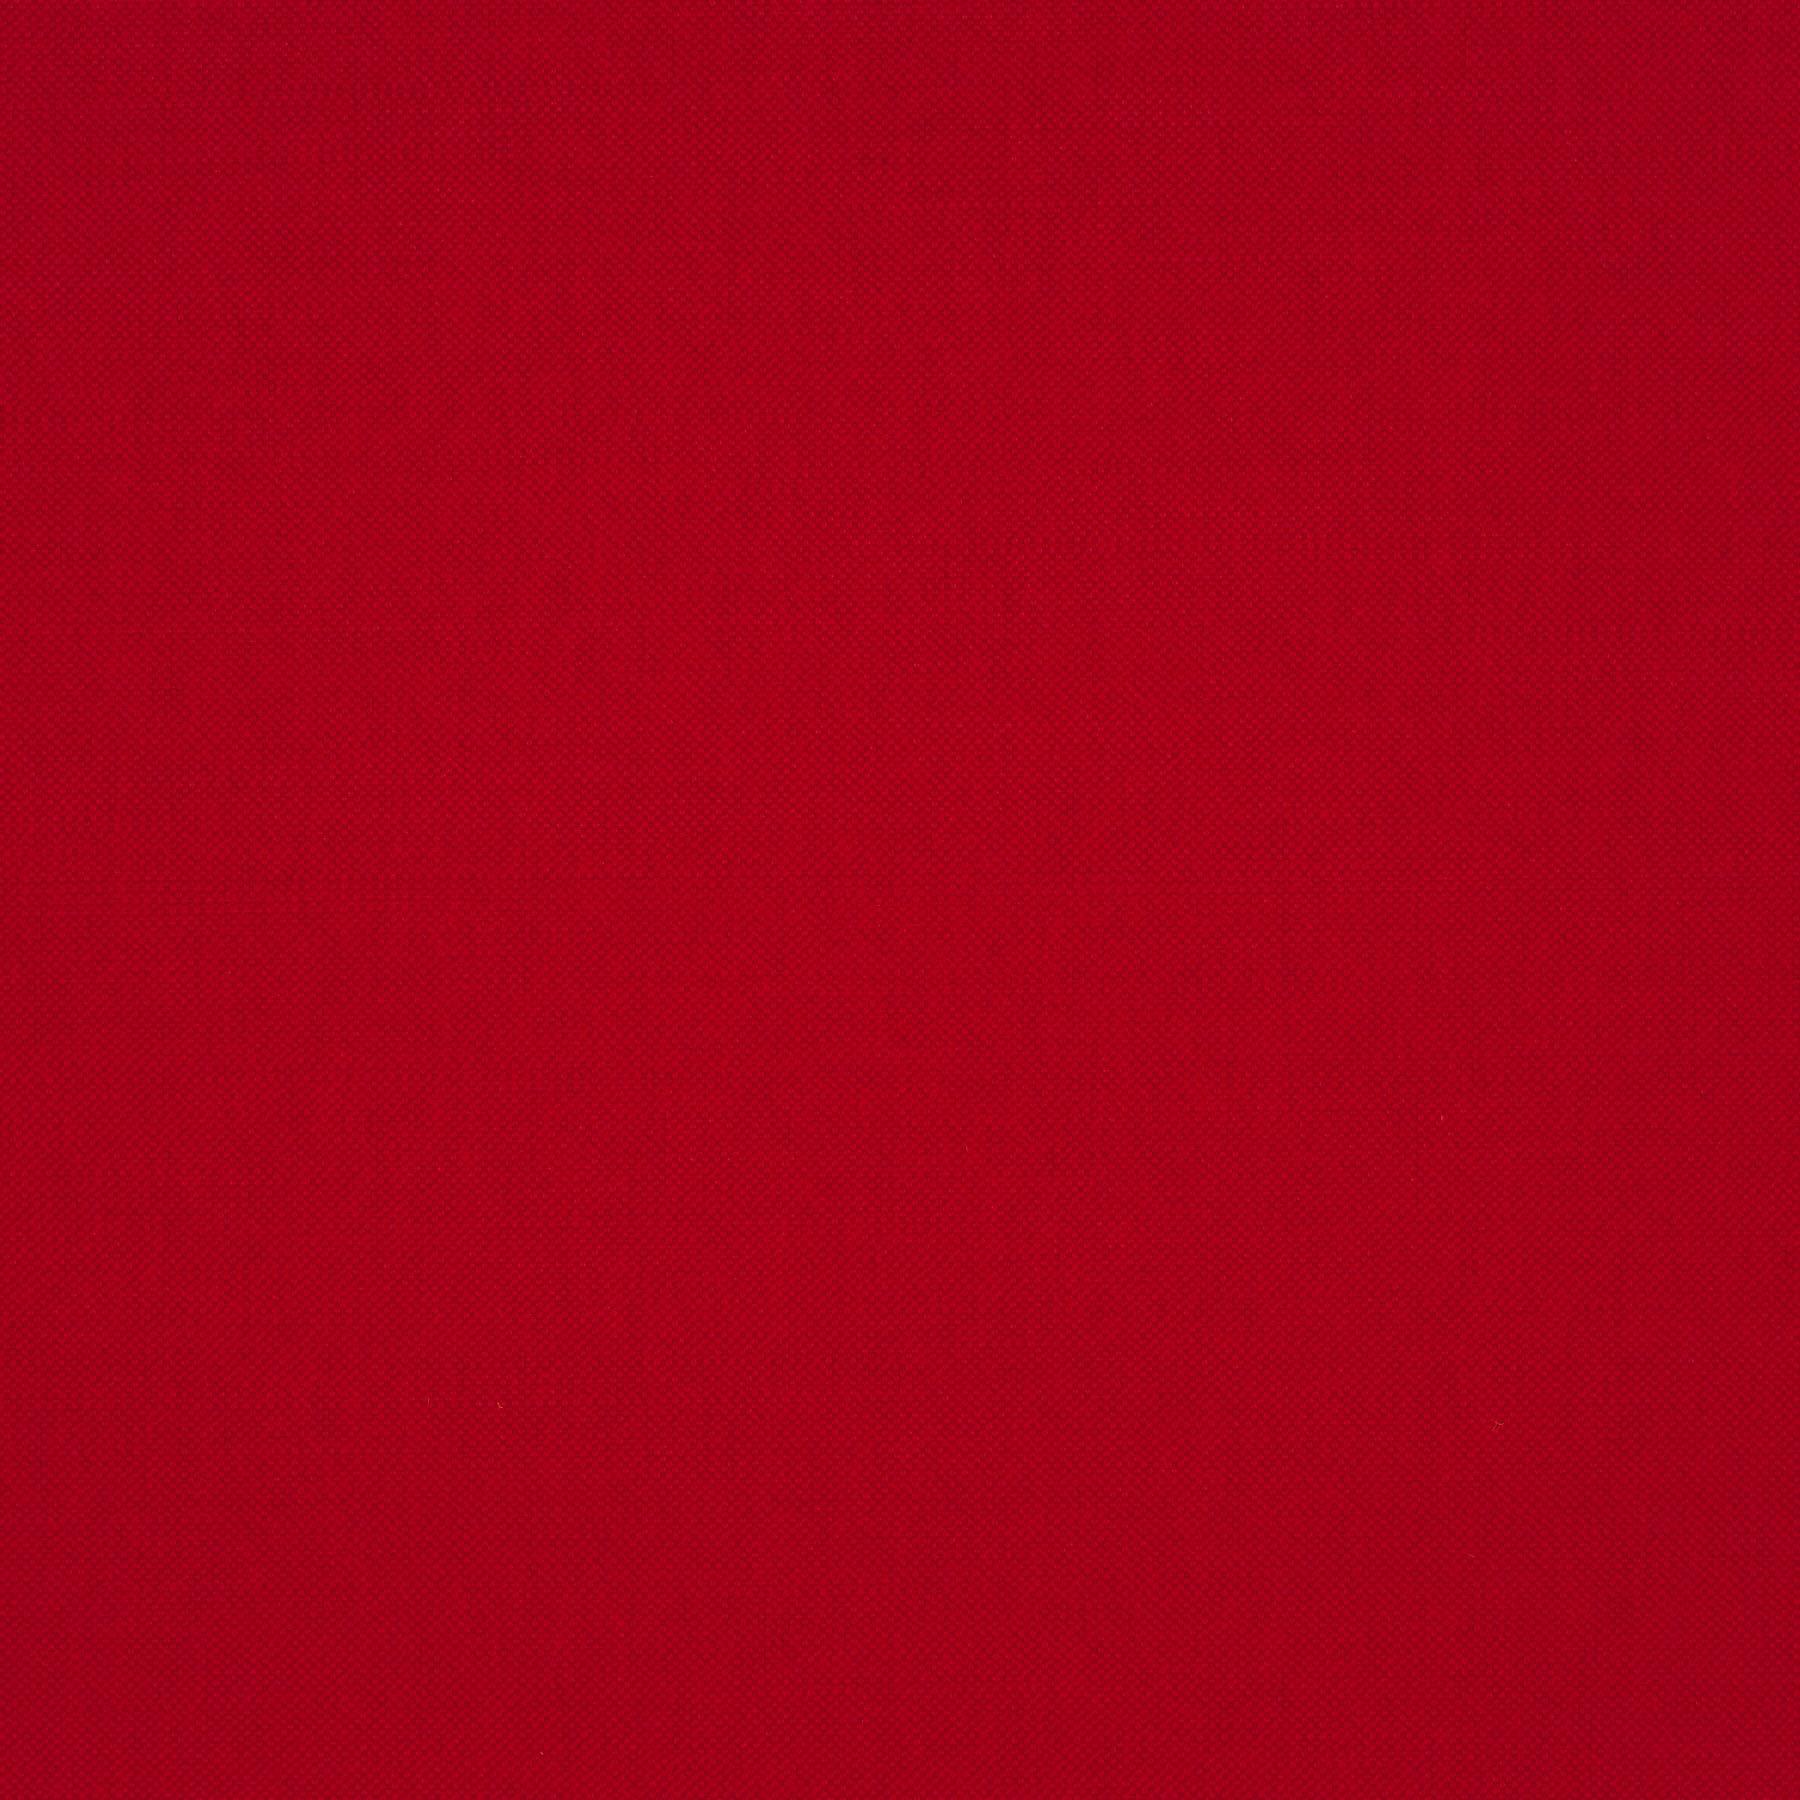 dyb rød hot madison CH1249/013-0